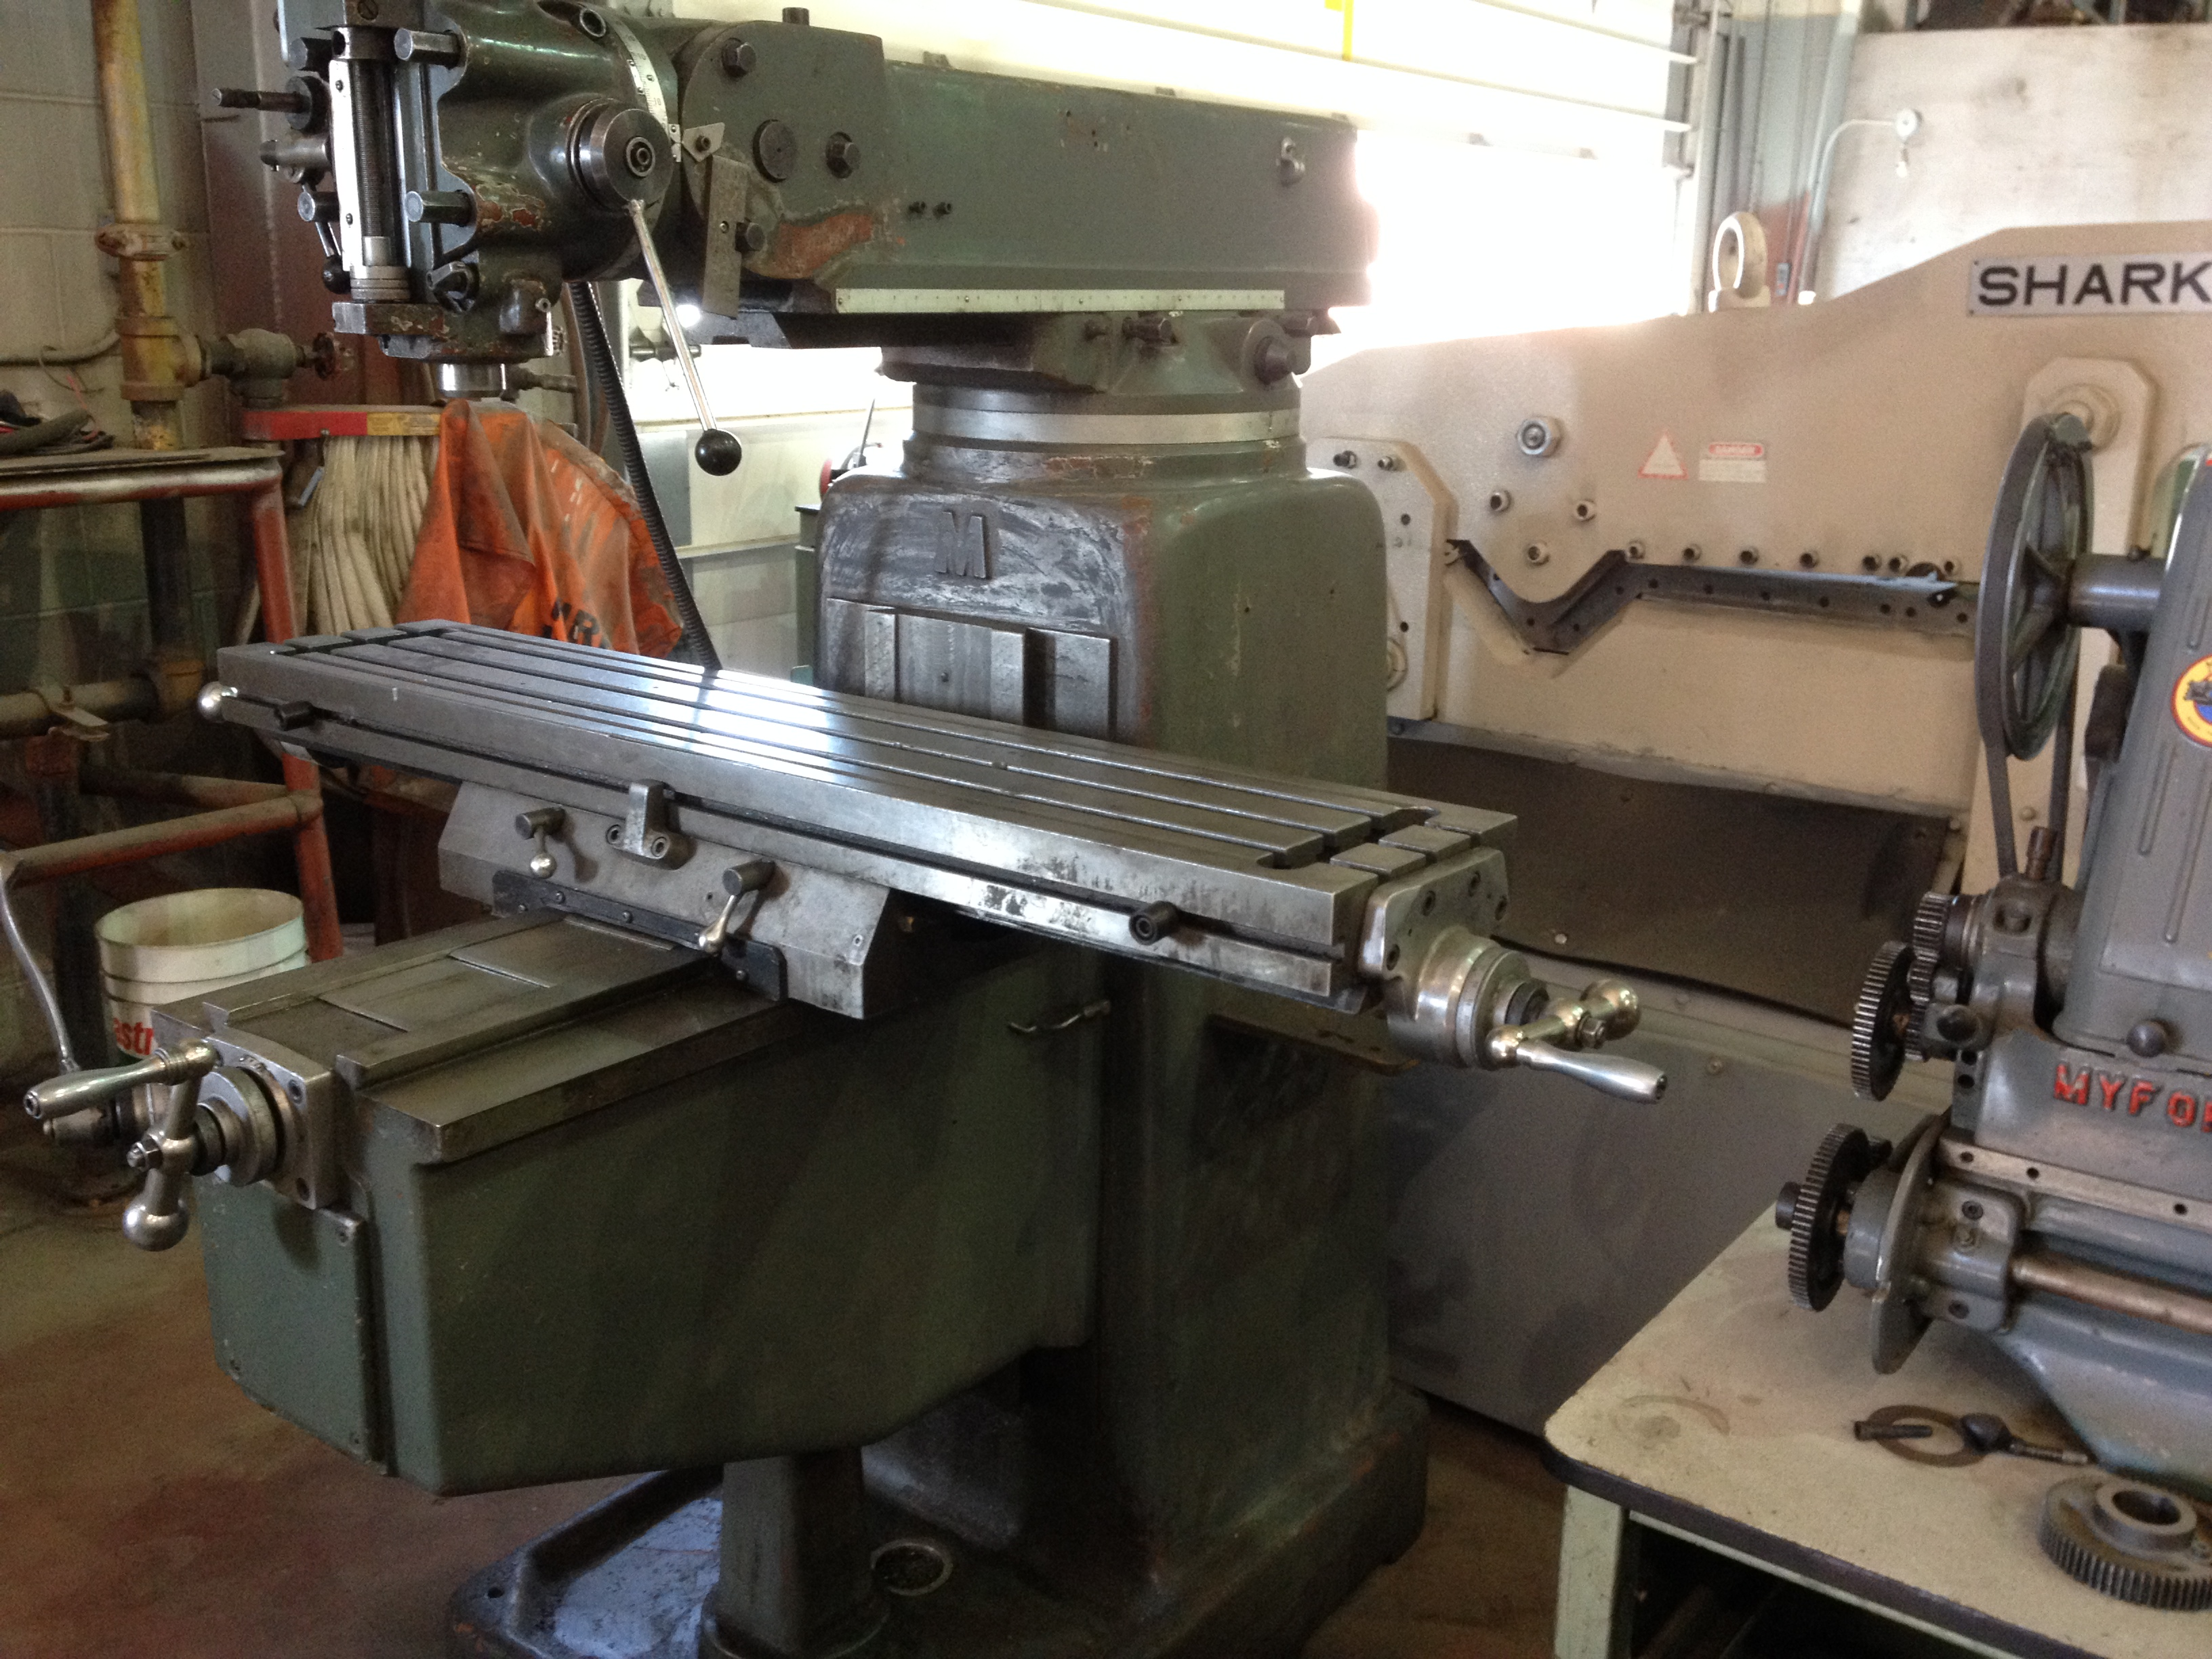 Horizontal Milling Machine >> » Milling Machines, Turret, Plain, Horizontal, Production, Universal, Huron-Style, Precision, Used